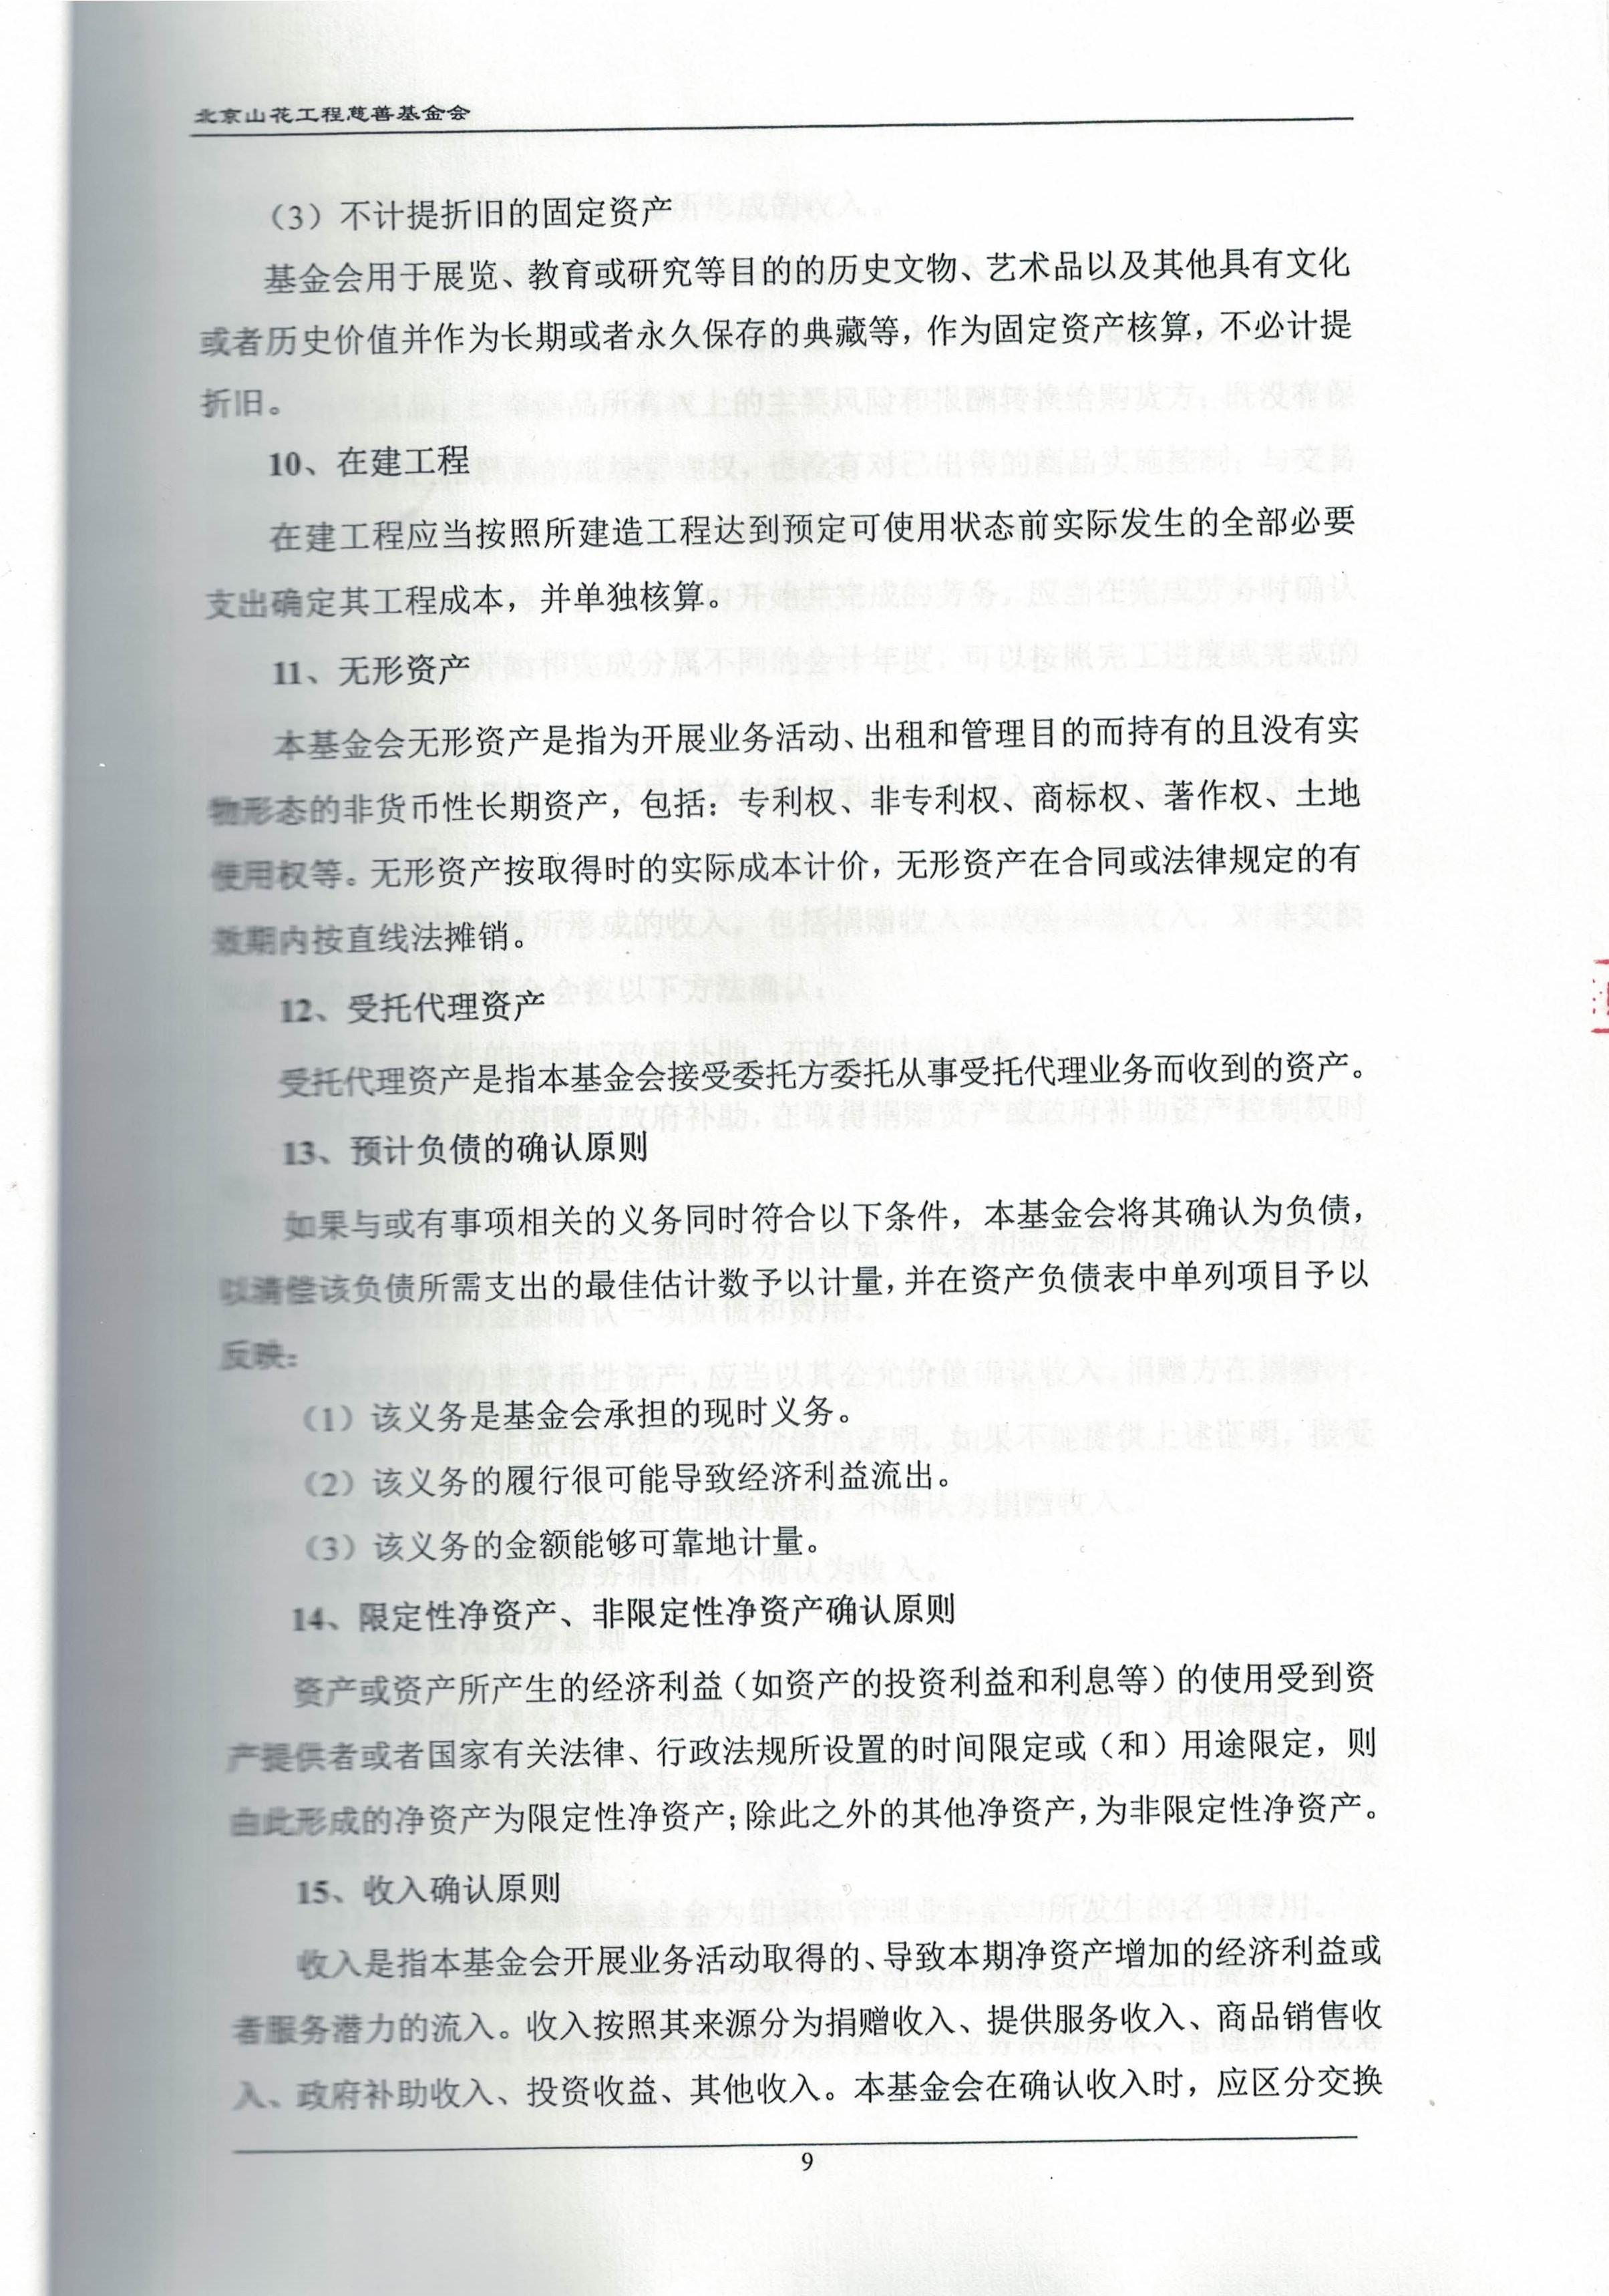 CCF20210114_0001_页面_11